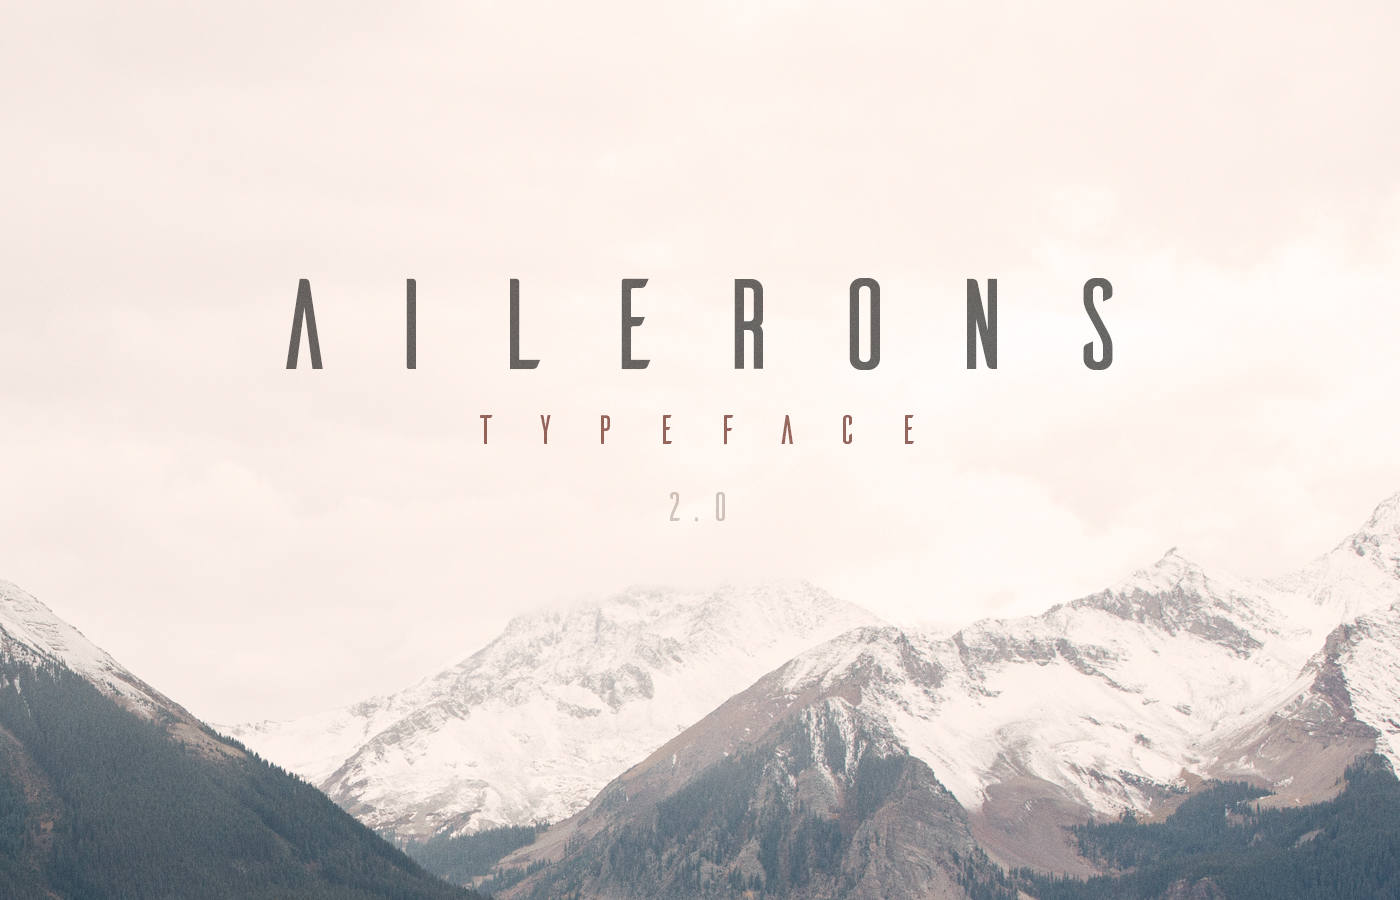 Typo Gratuite Ailerons | Free Font | Studio Karma